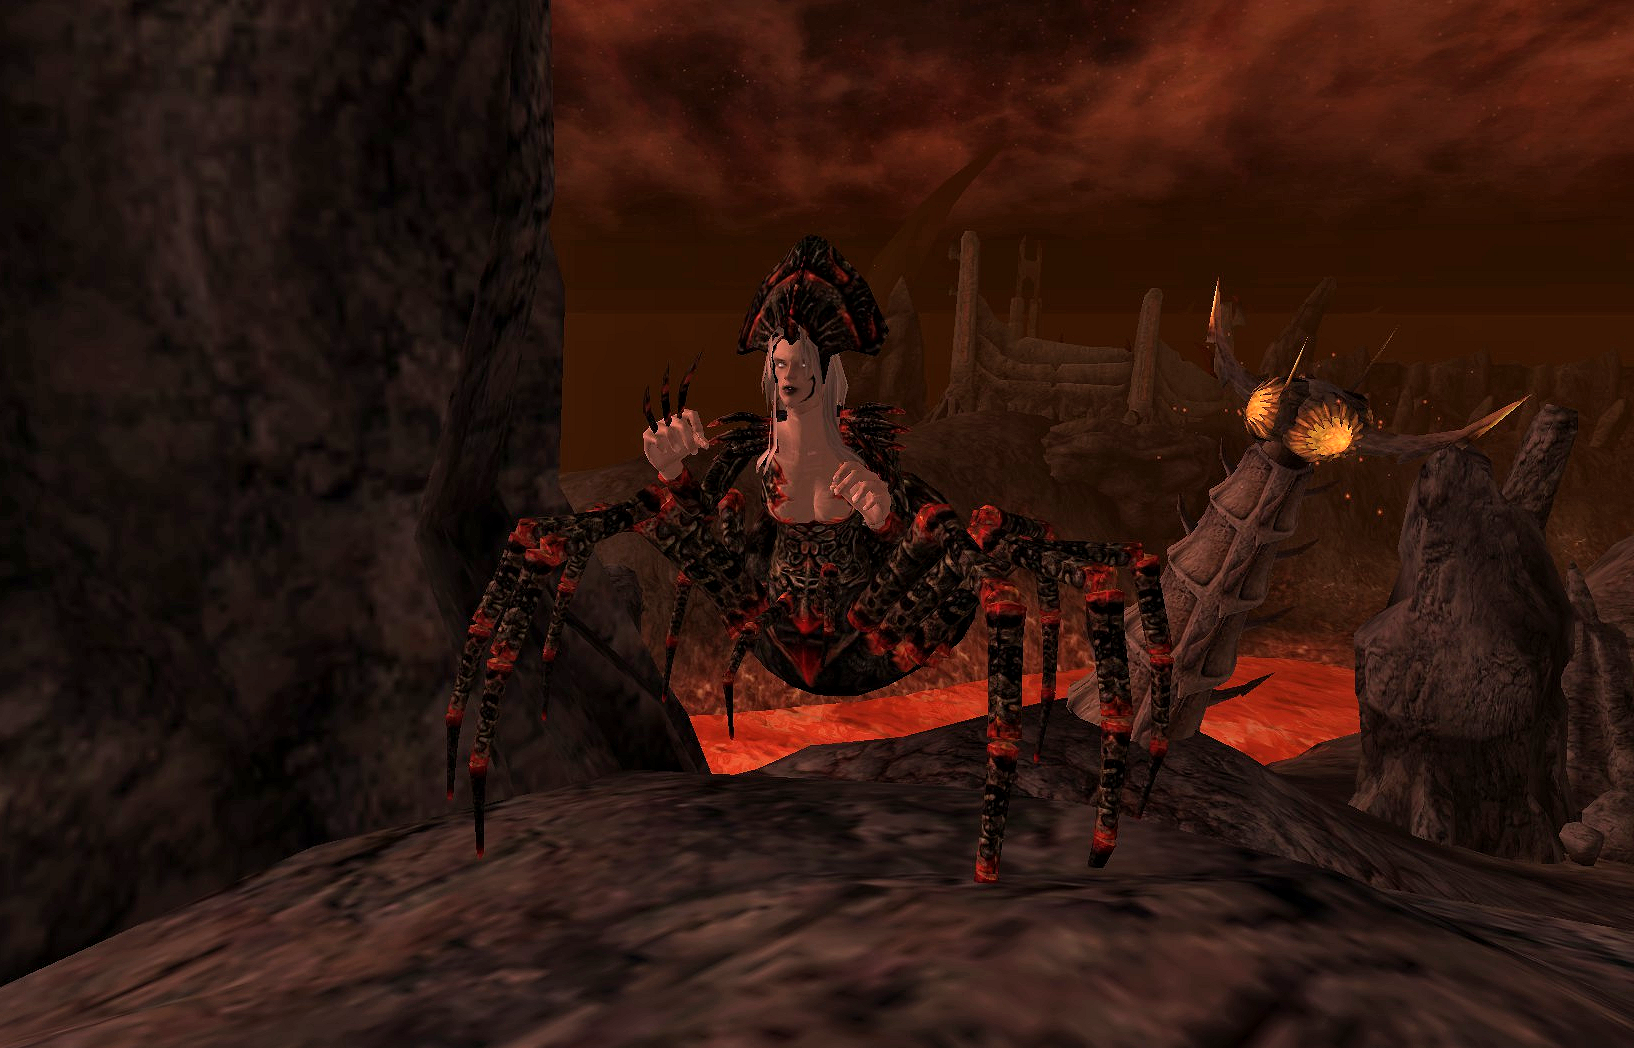 spider daedra oblivion elder scrolls fandom powered by wikia